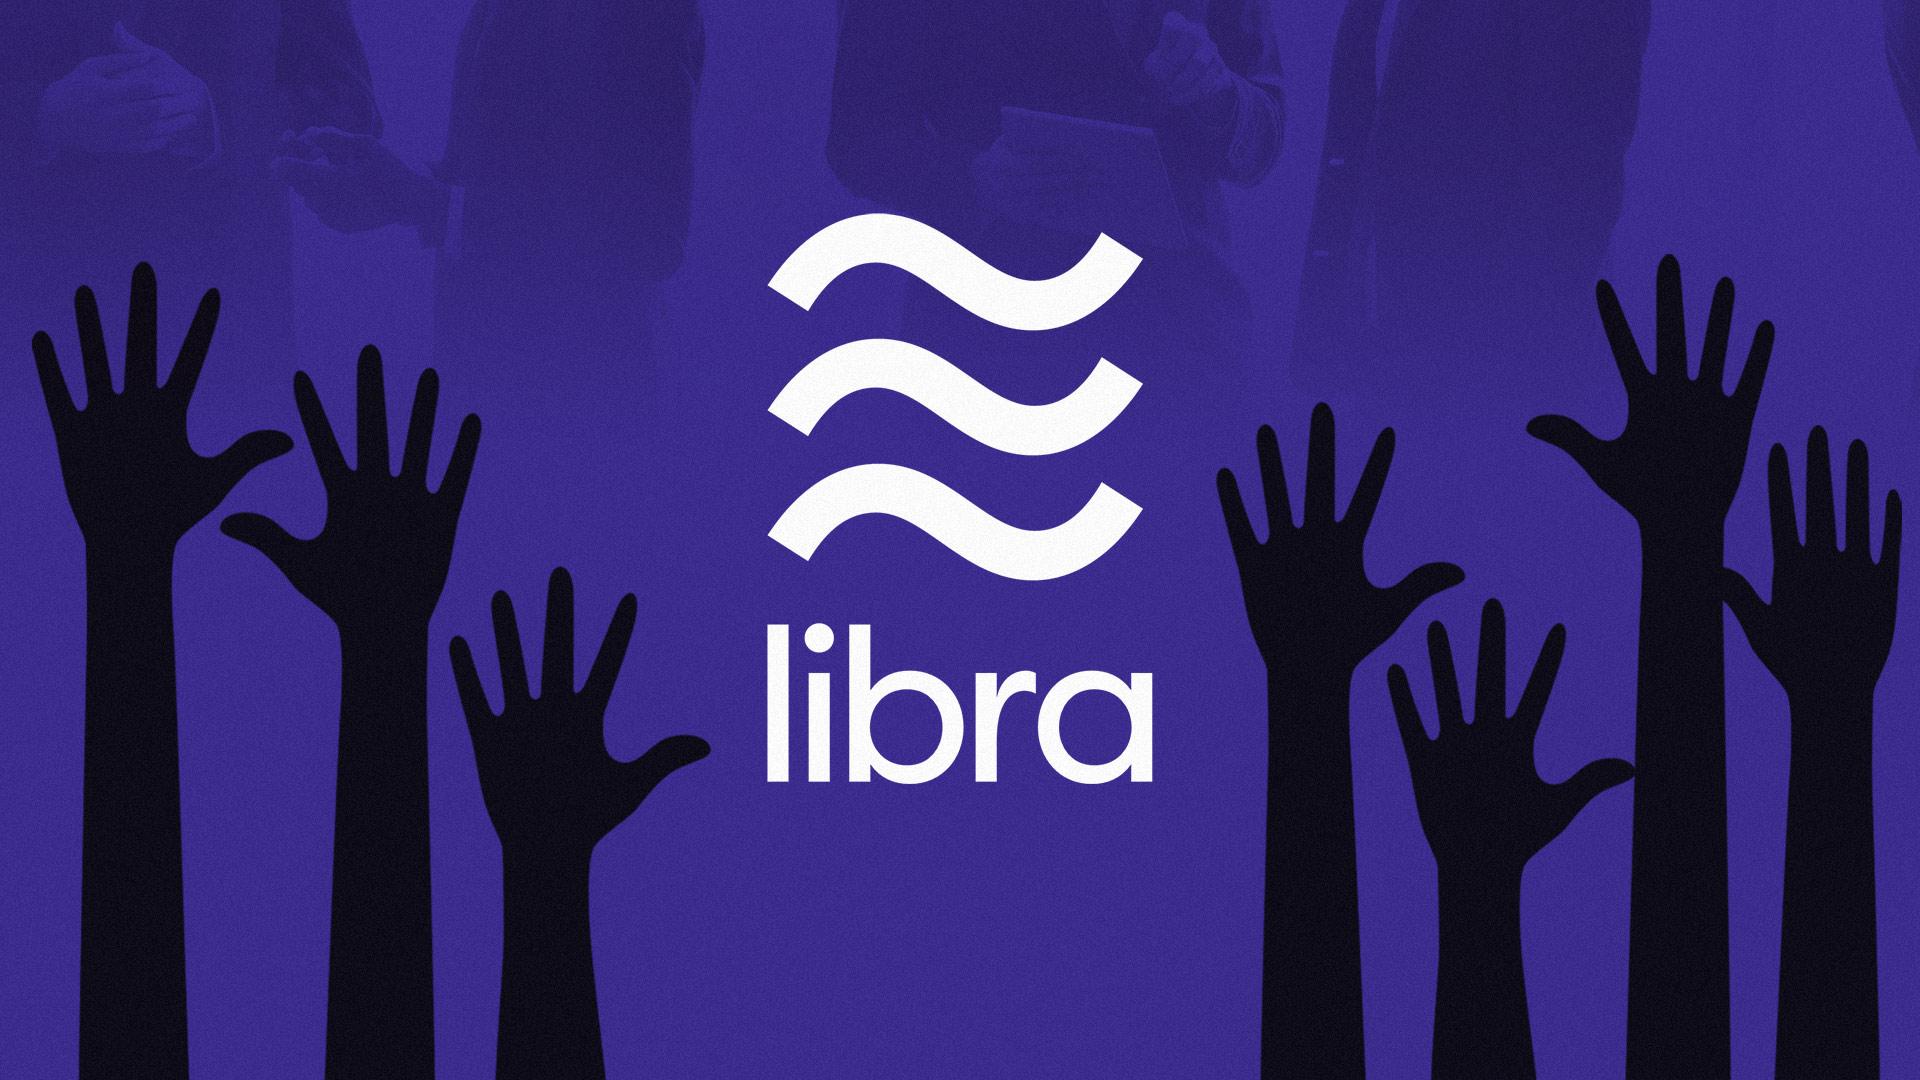 facebook-project-libra-particpants.jpg